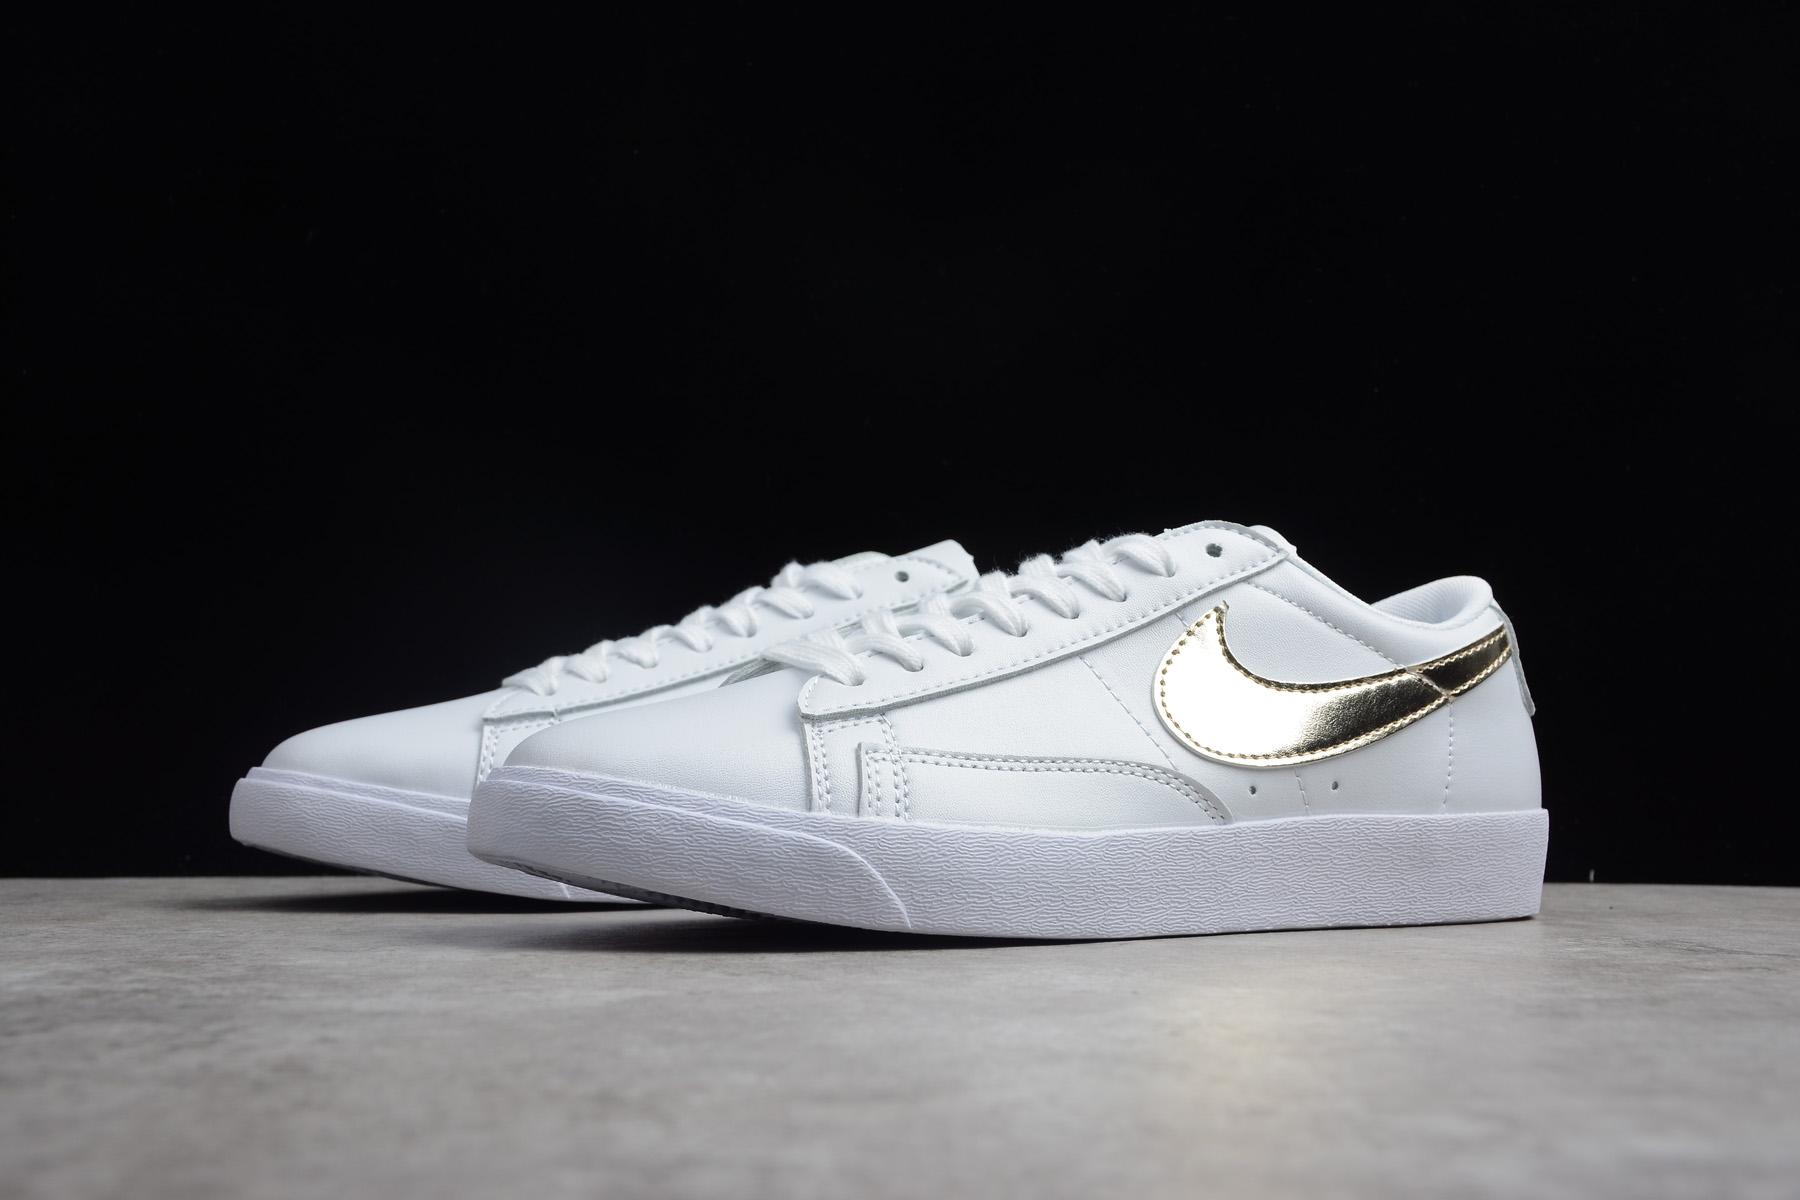 100% authentic 0ee54 93cae Women's Nike Blazer Low LE White/Metallic Gold Star AA3961-103